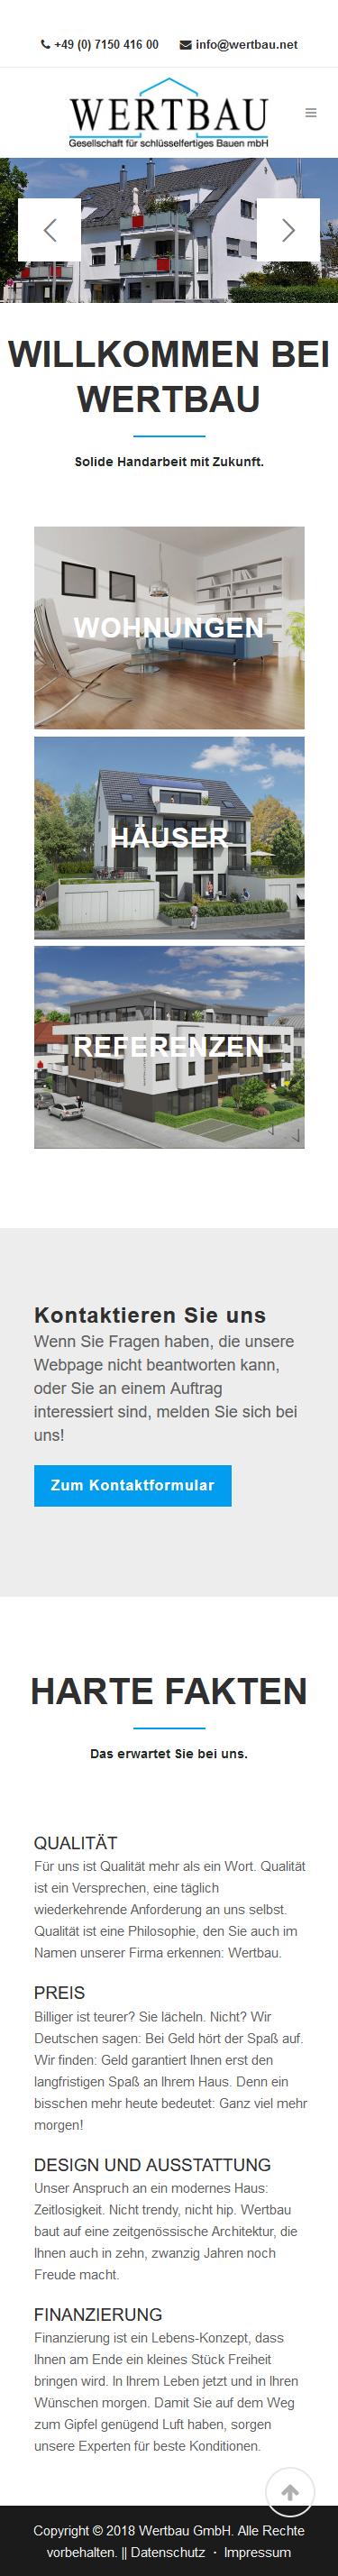 Makler-Wohnbaugesellschaft Webdesign -Smartphone